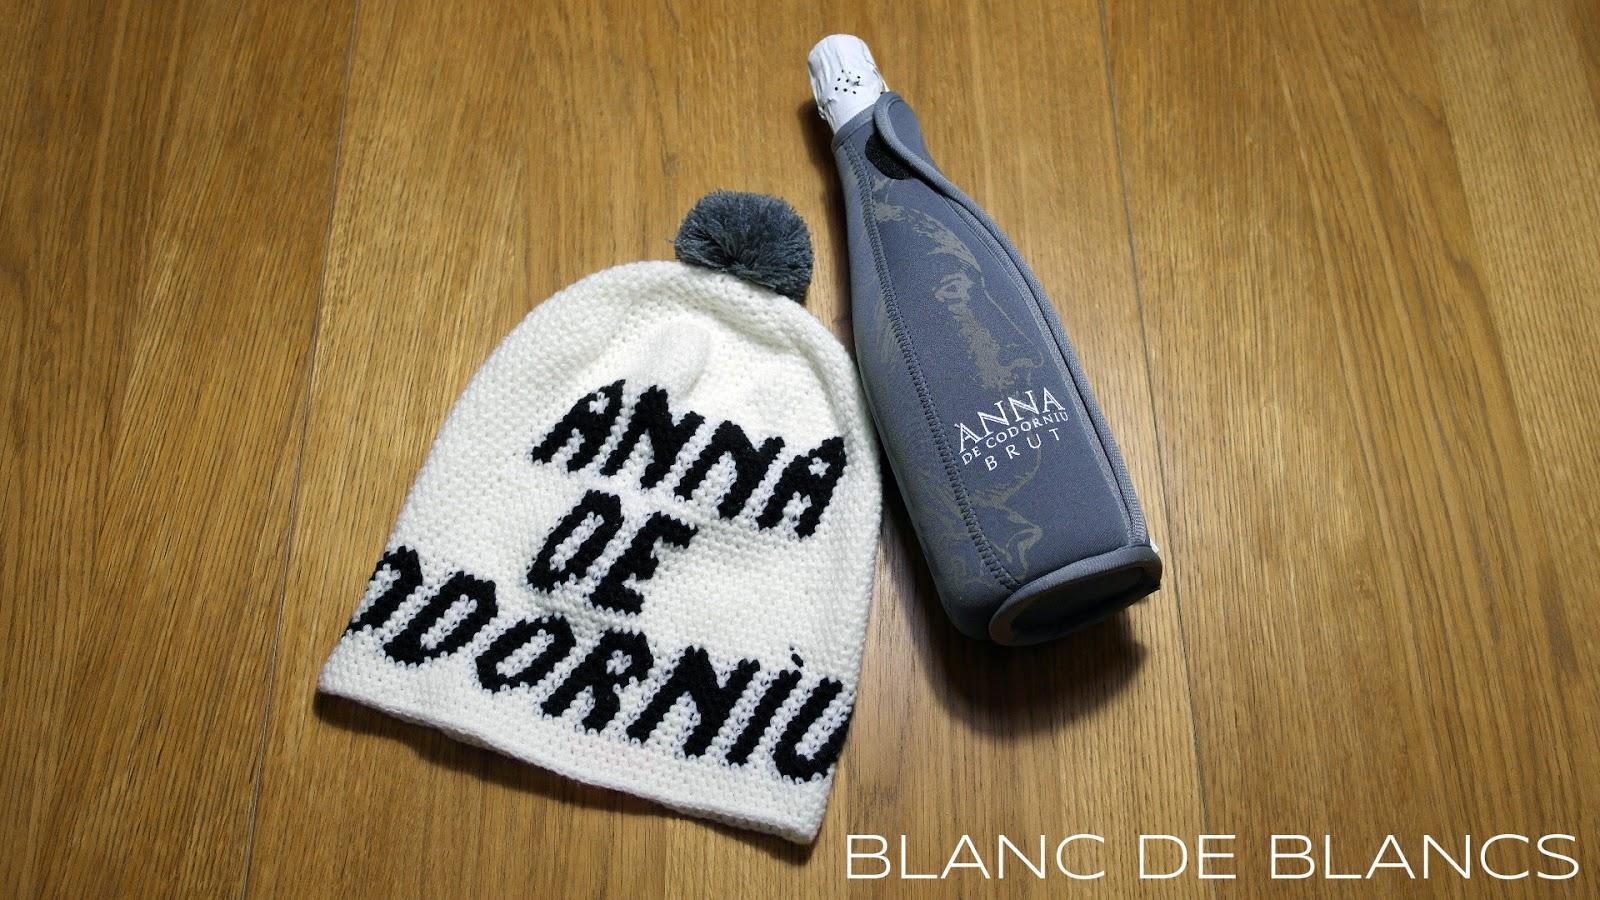 Annan-päivän juhlaa - www.blancdeblancs.fi